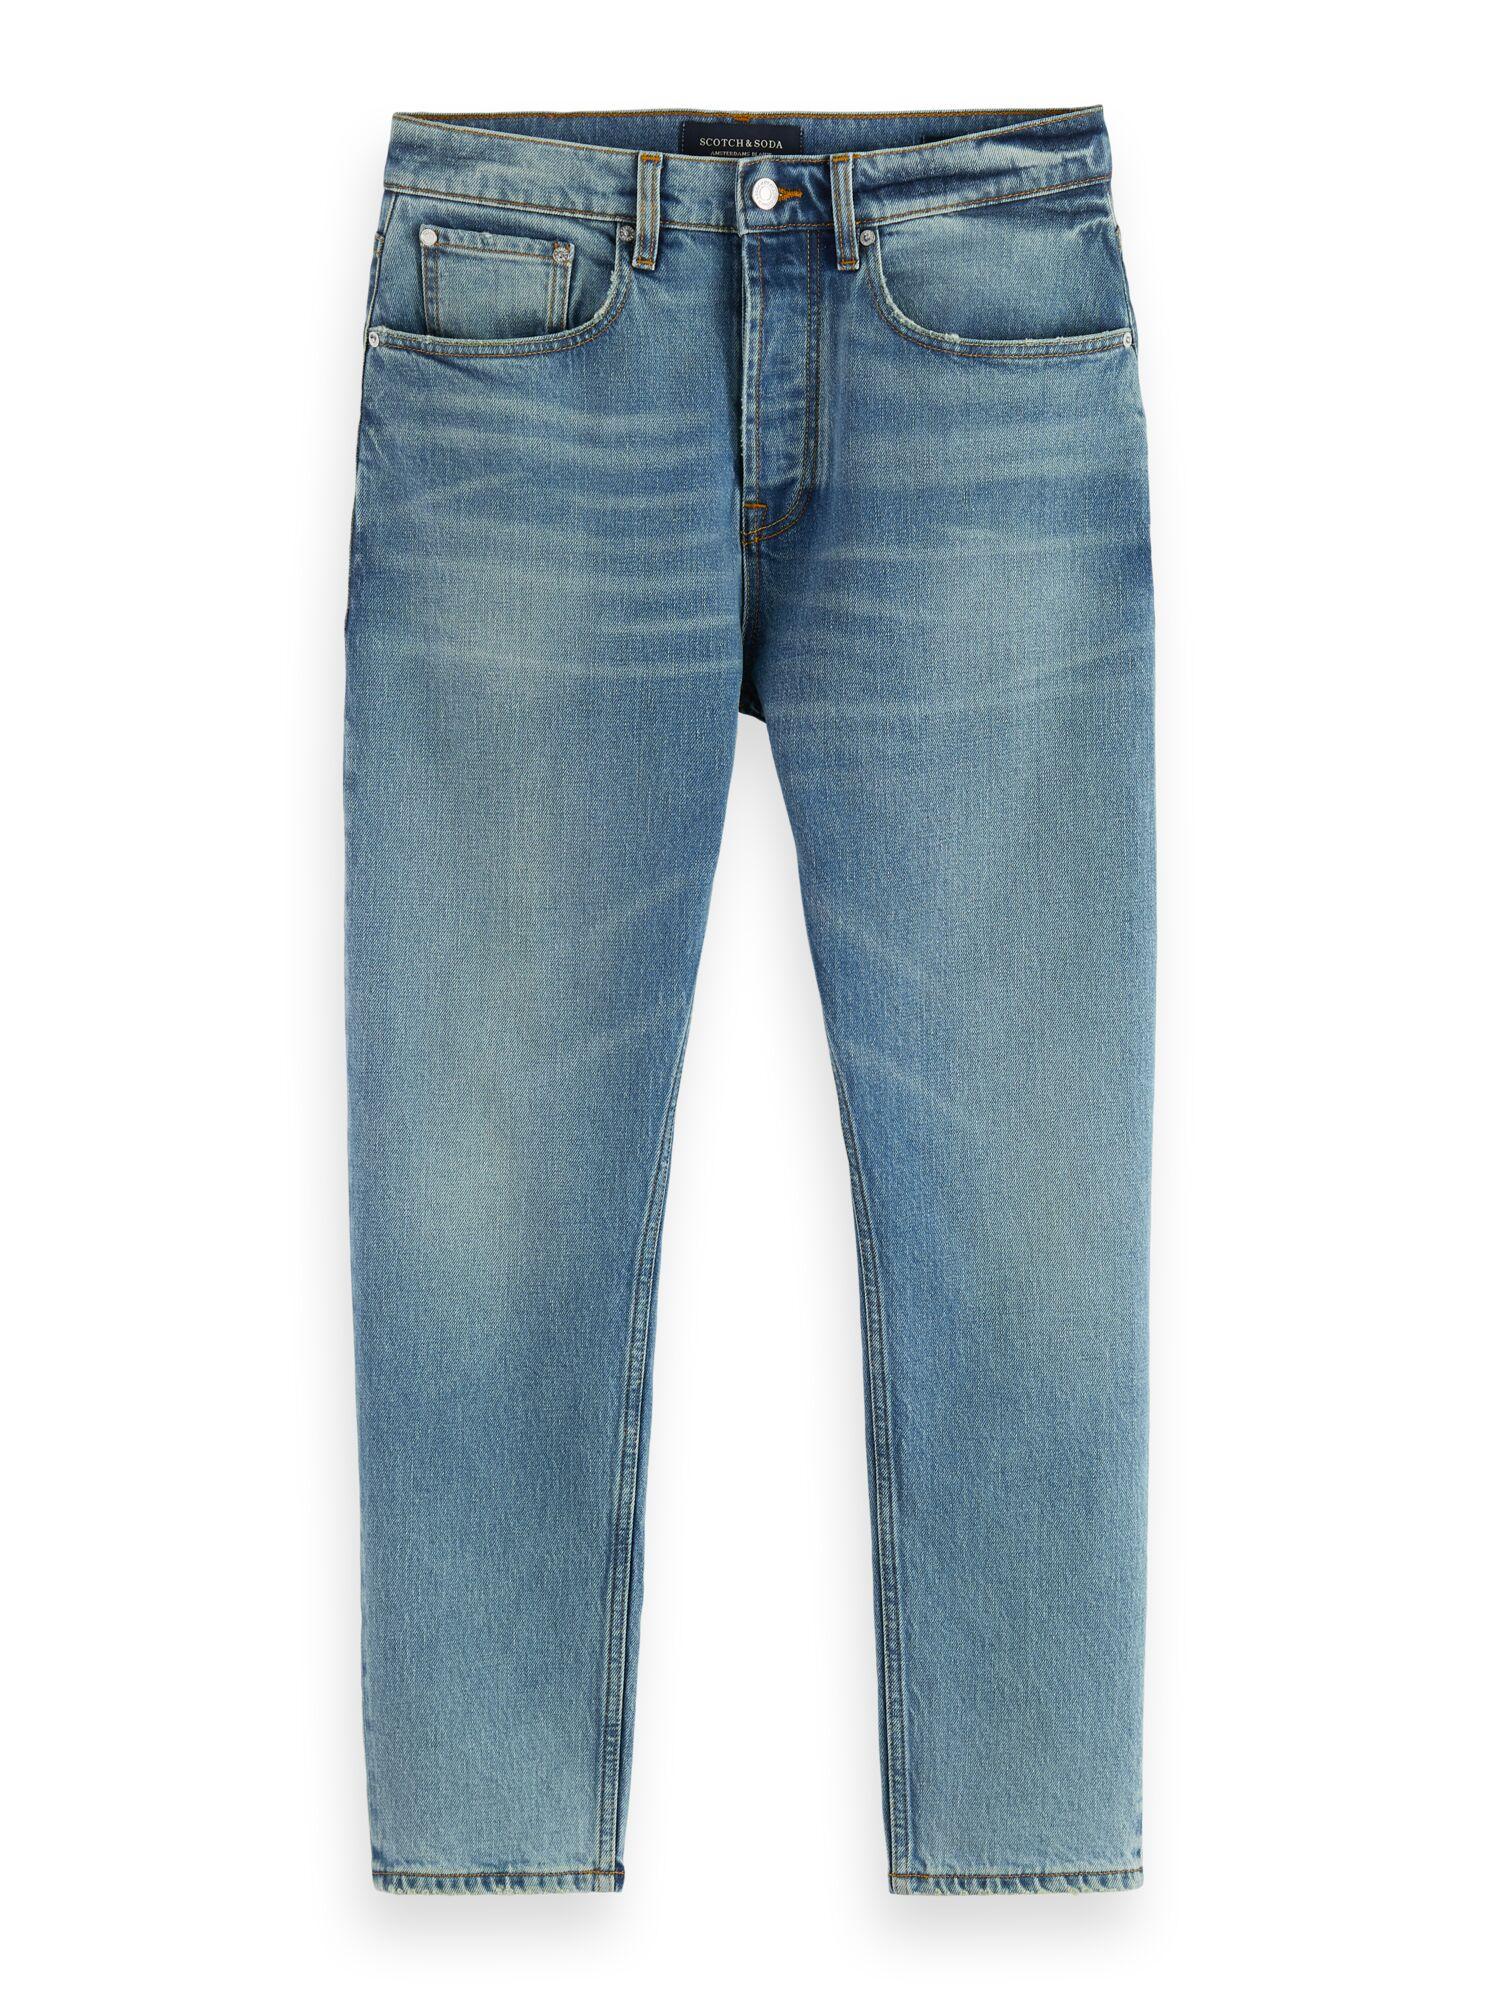 Scotch & Soda | Dean loose taper jeans in Organic Cotton-Break the Record